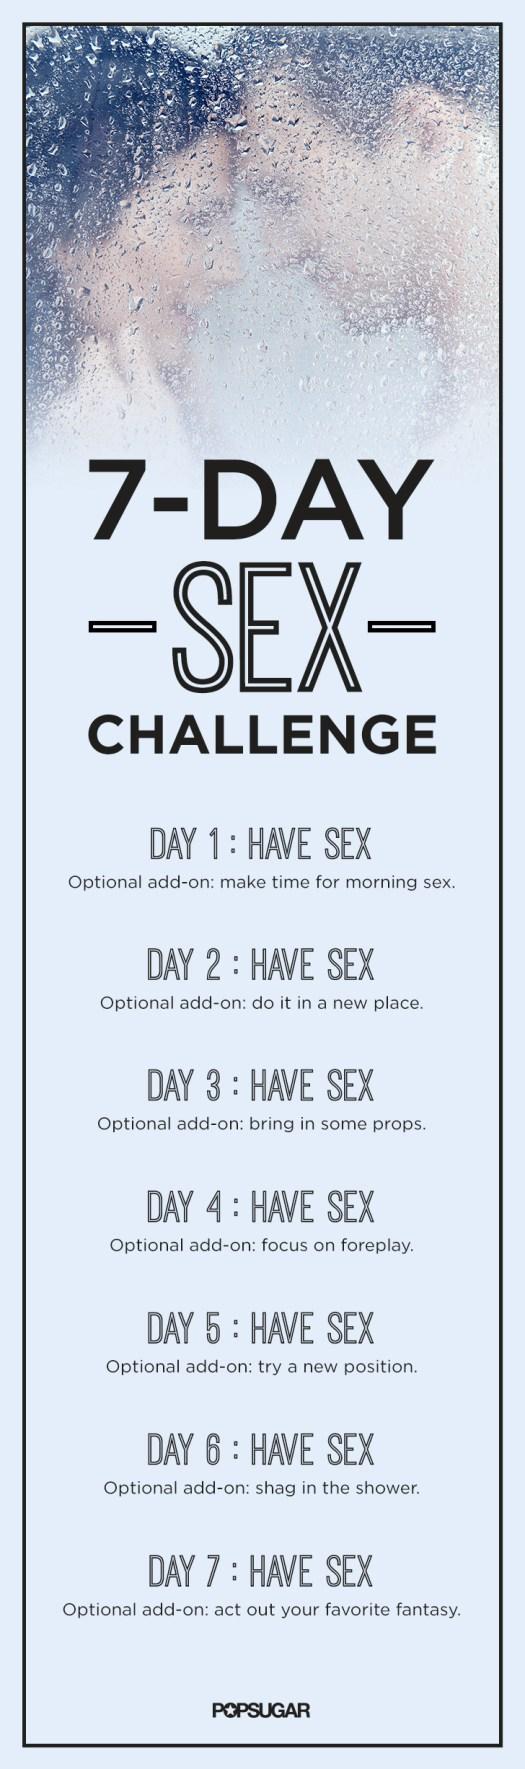 Weekly Sex Challenge